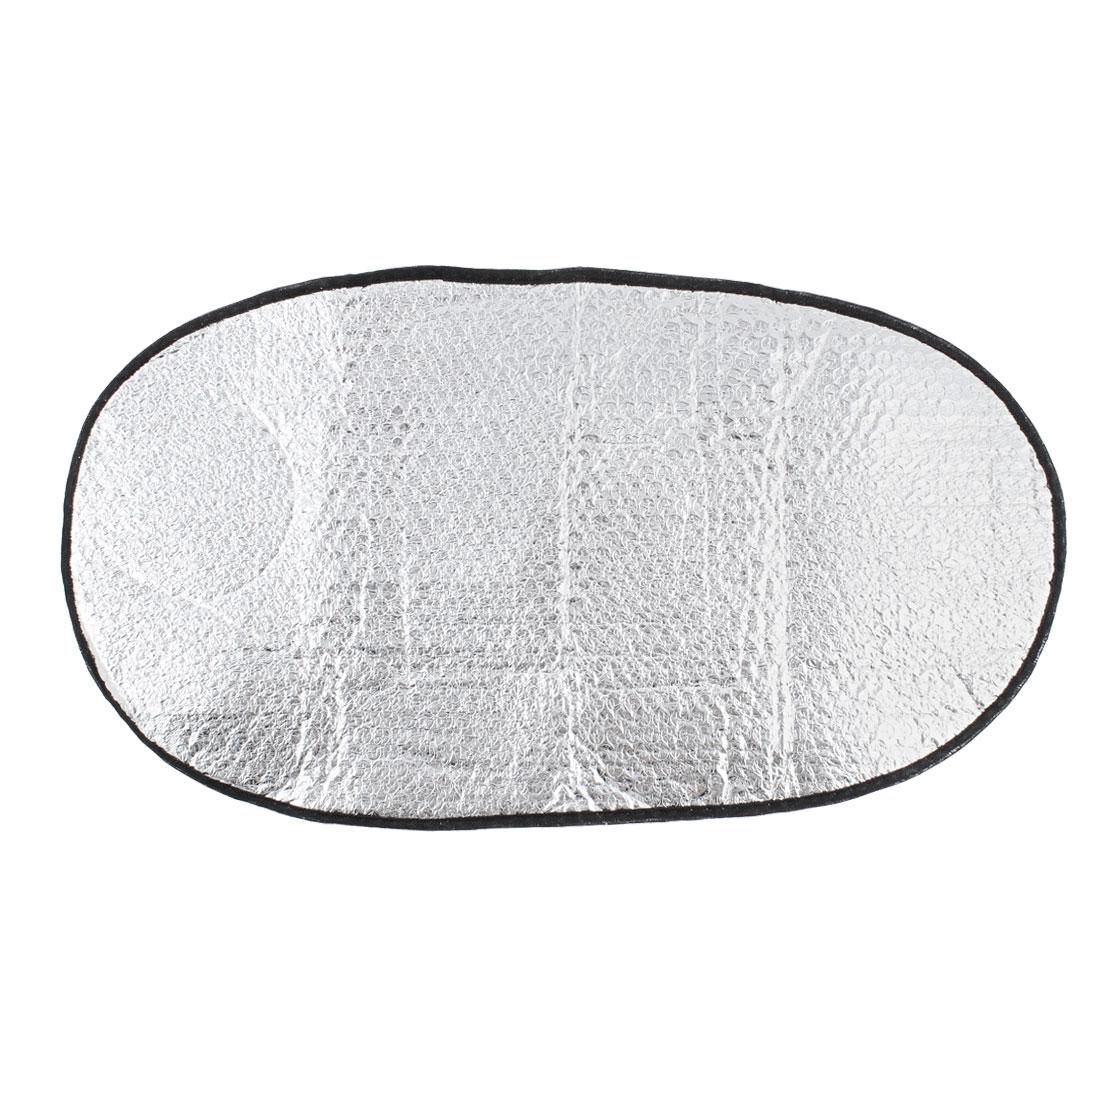 Motorcycle Heat Insulation Pad Aluminum Foil Waterproof Cushion Mat Seat Cover 60cm x 36cm